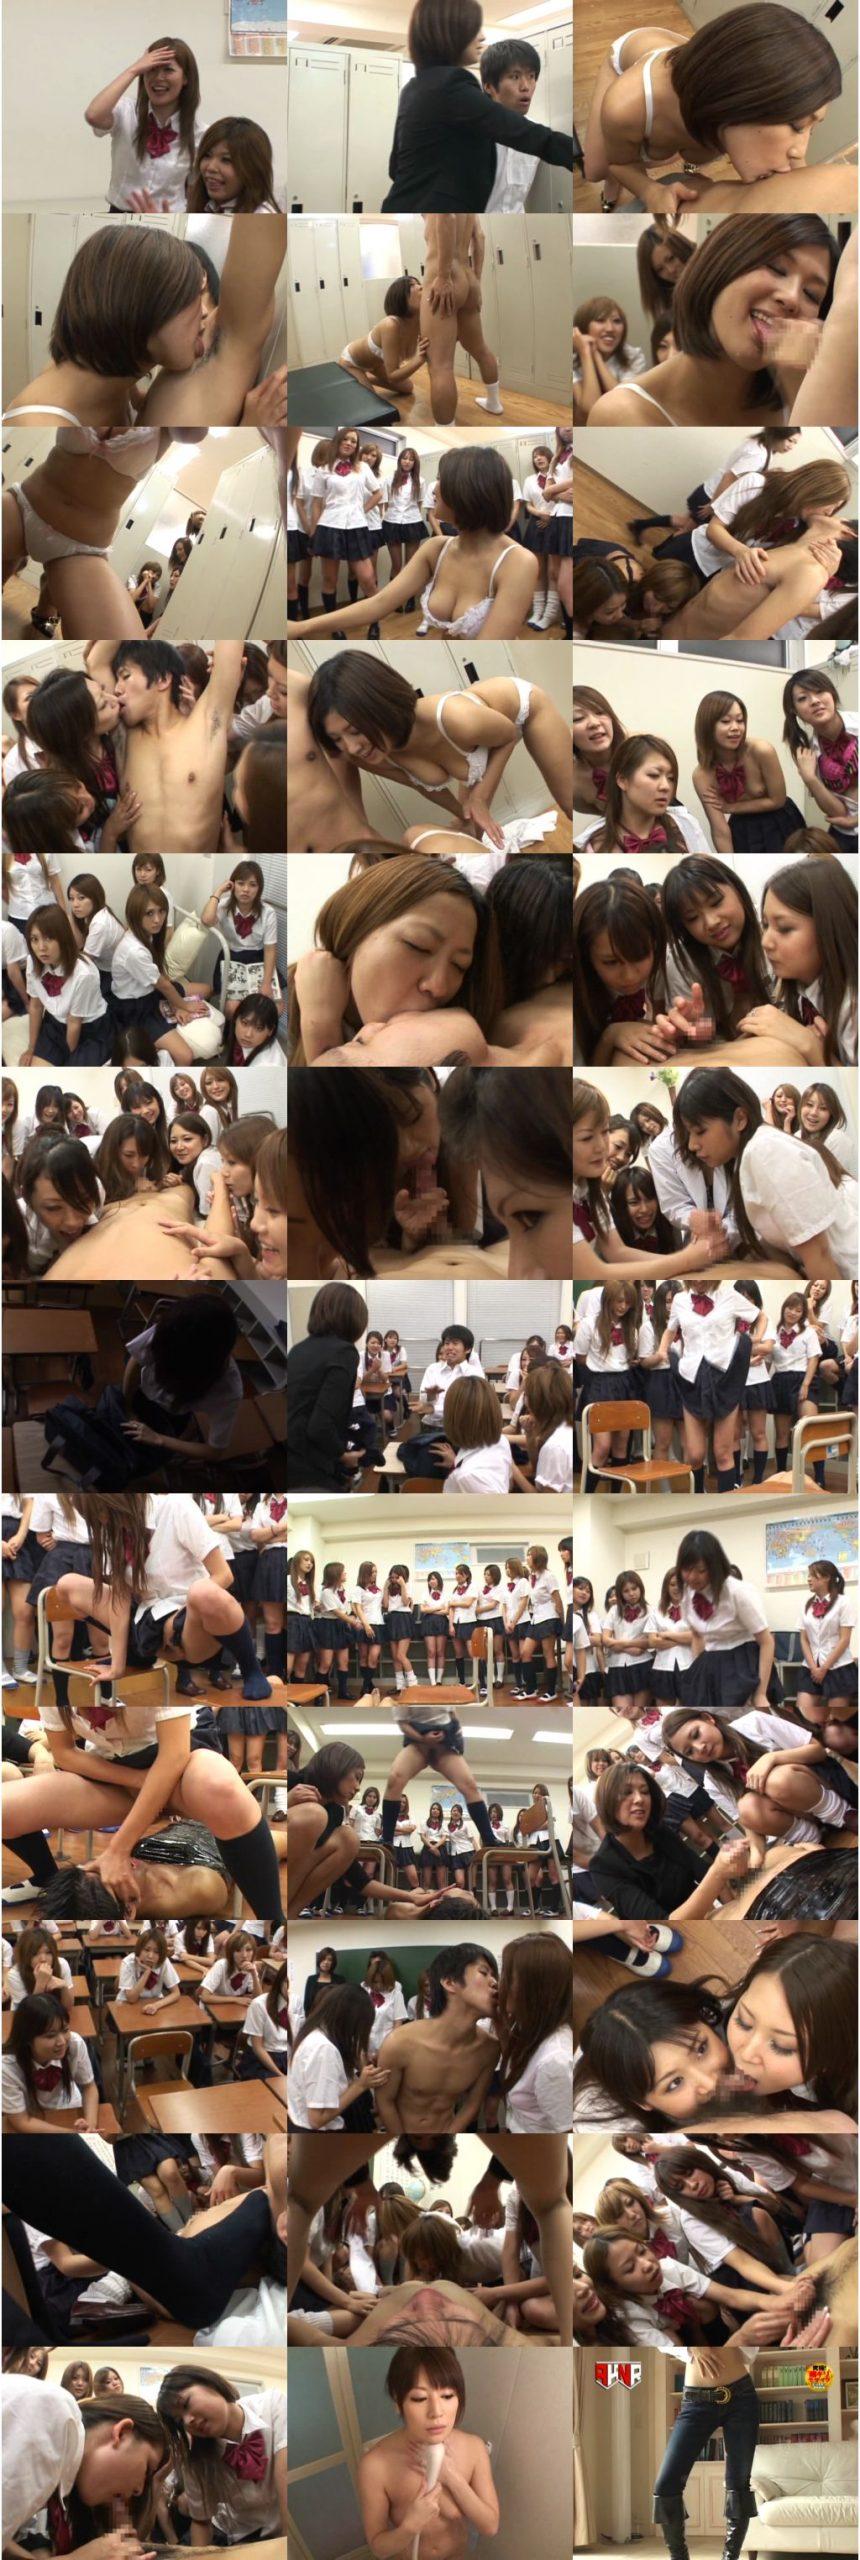 fset 174 s scaled - [FSET-174] 転校したら男は僕一人ぼっちだった…。 5 女子校生 コスチューム 一条れん その他女子校生 乱交